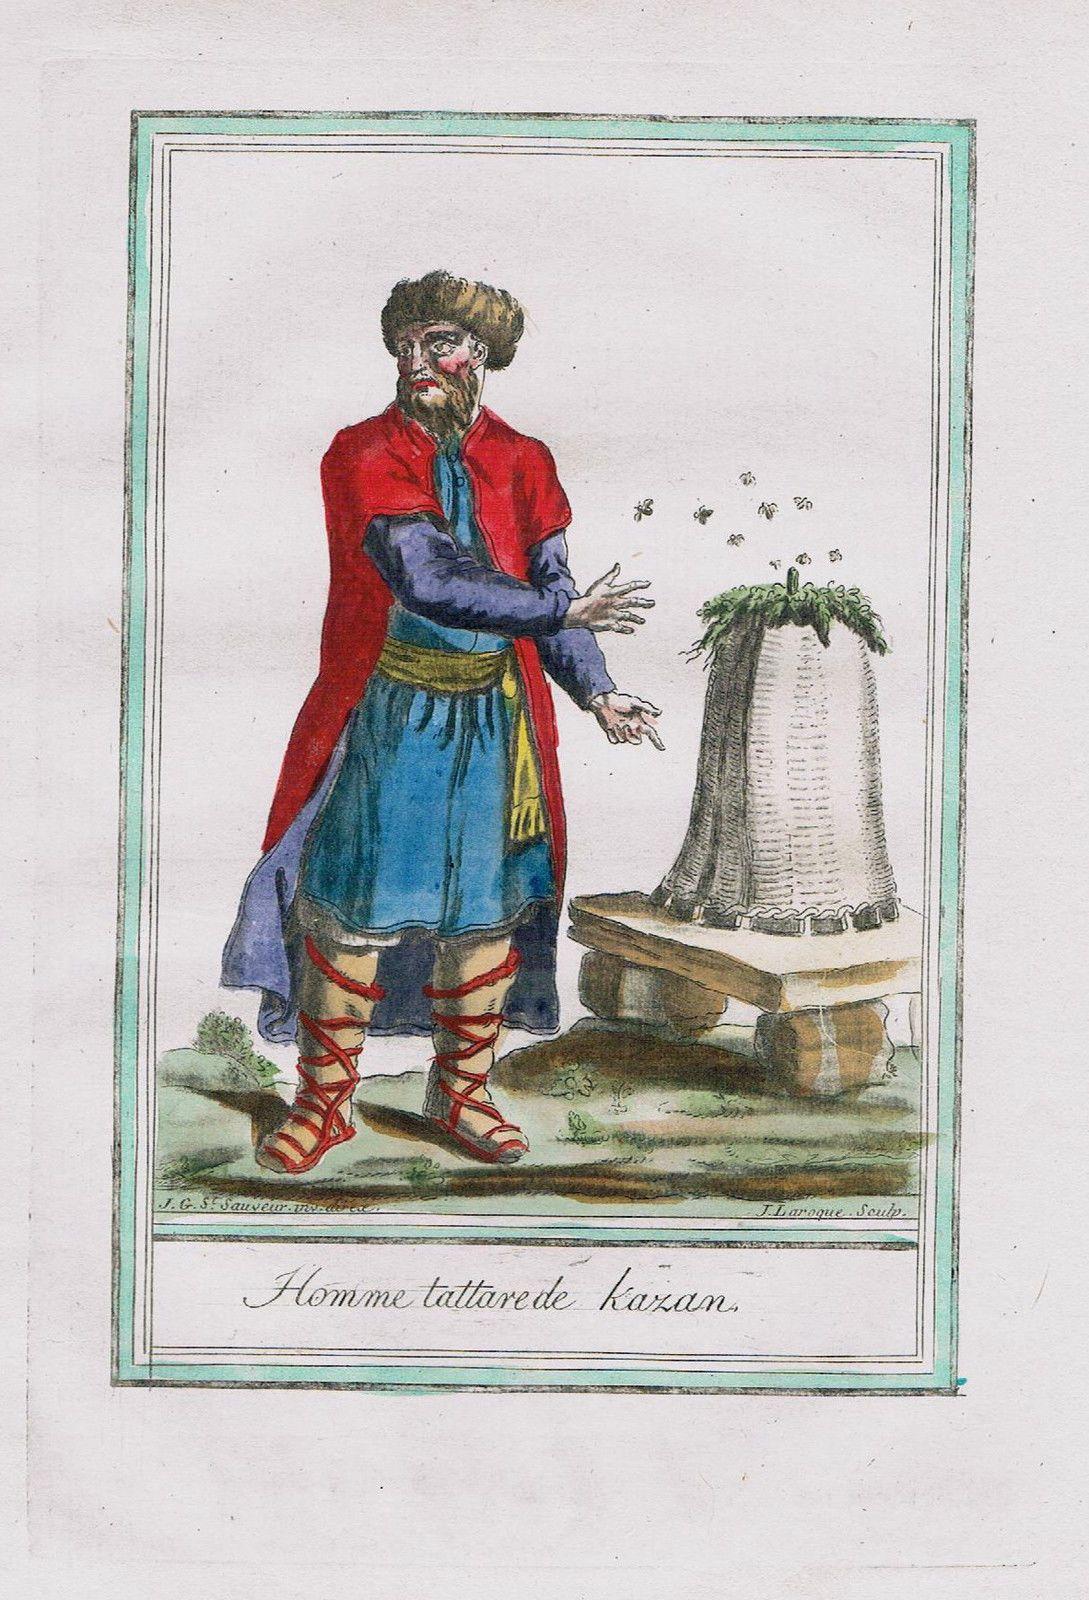 1780 Kazan Tatarstan Russia Tatars Tartary Costume